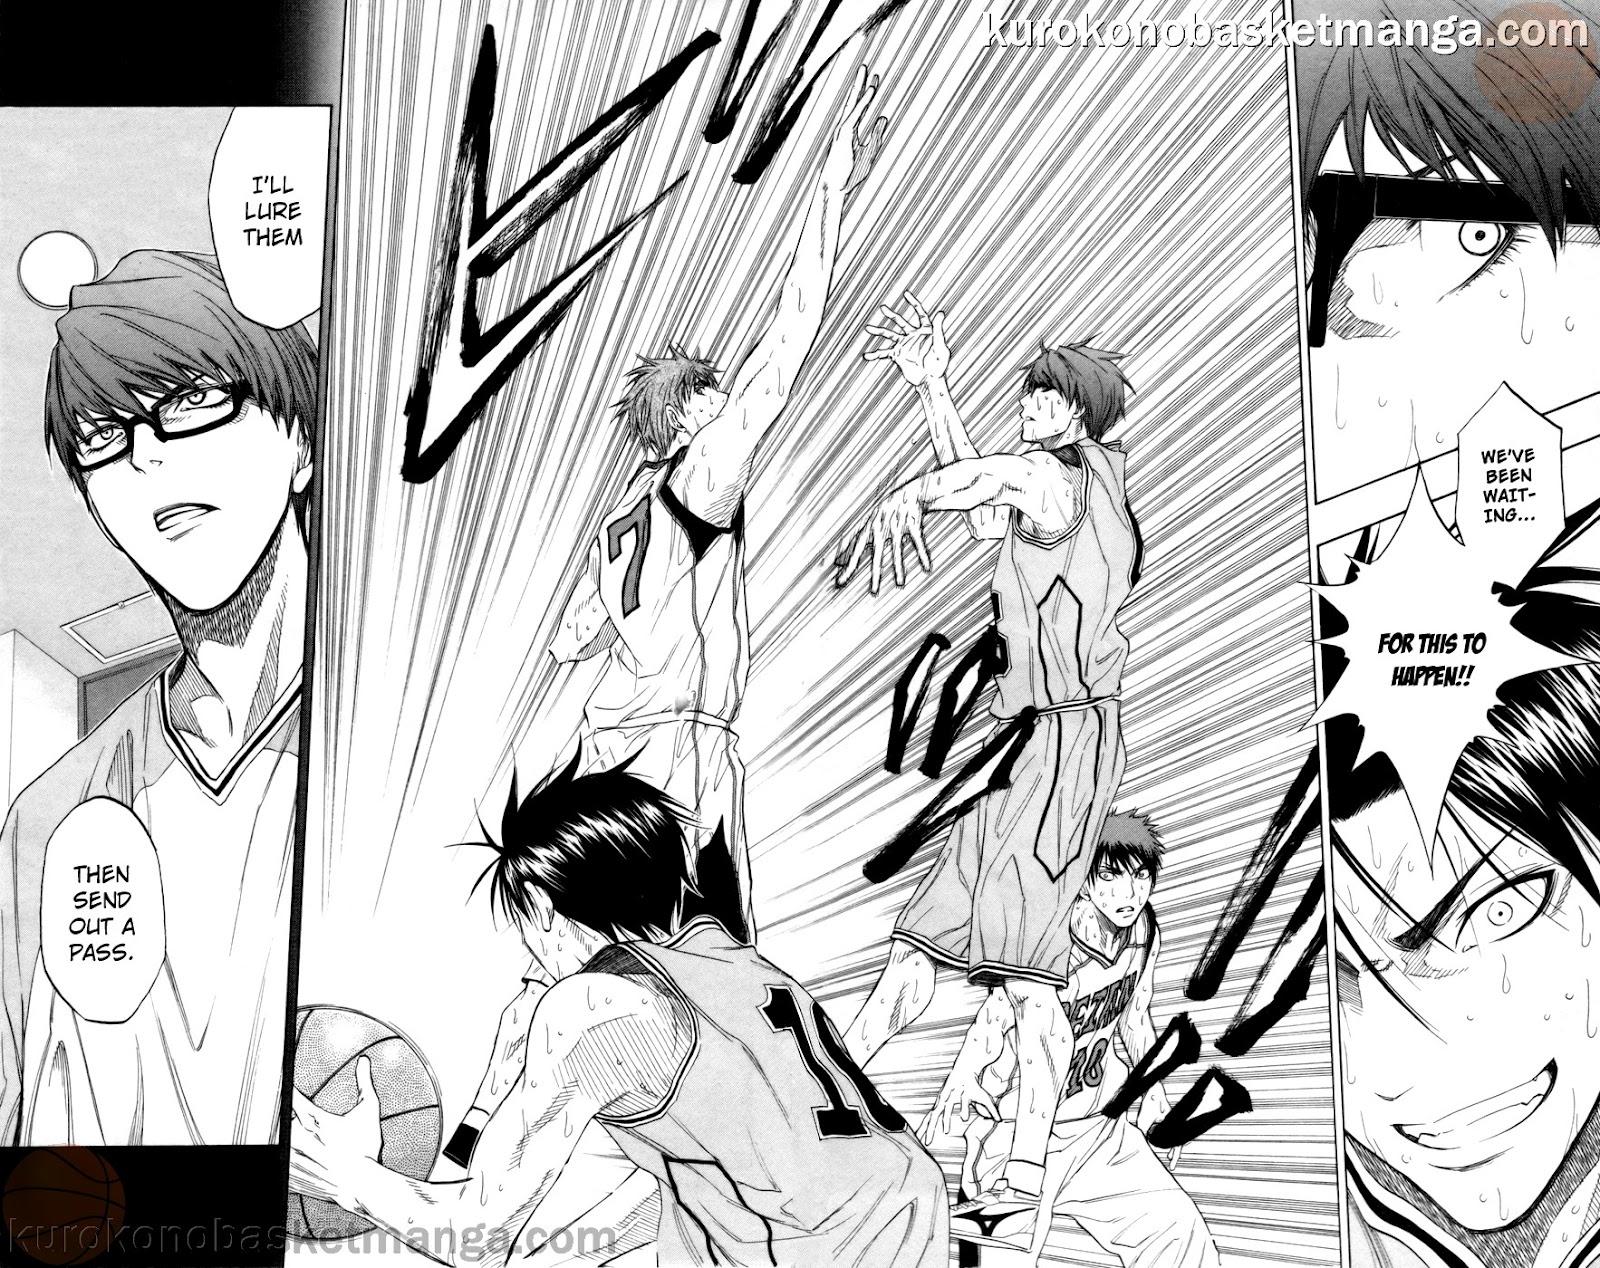 Kuroko no Basket Manga Chapter 87 - Image 18-19